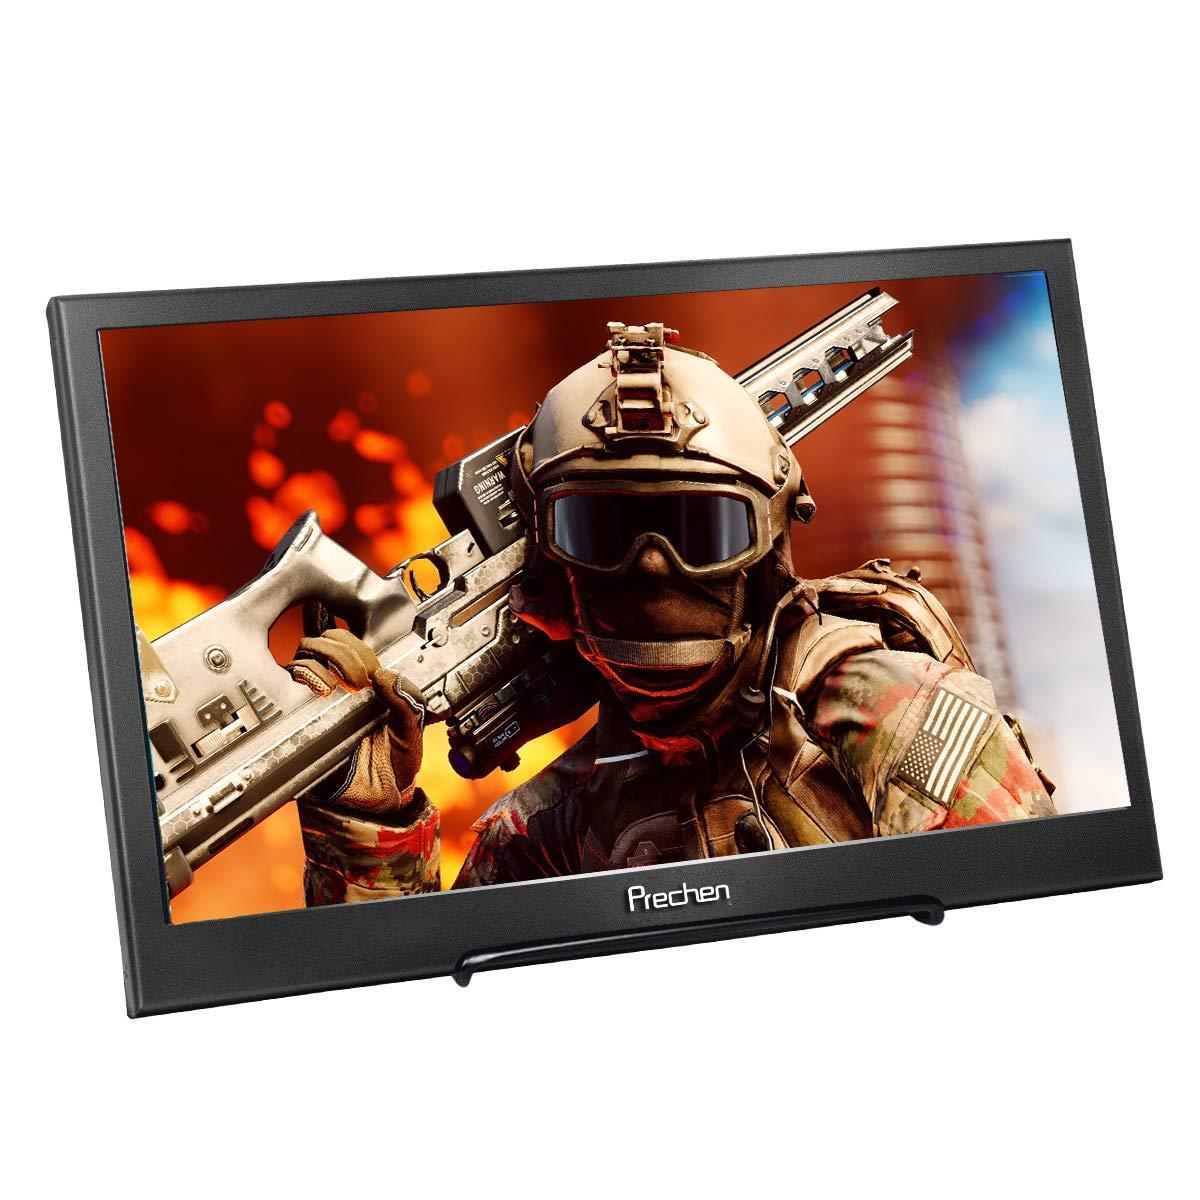 Prechen Portátil Monitor IPS Pantalla Full HD 13.3 pulgadas 1920x1080 portátil Monitor aluminio carcasa HDMI monitor Pantalla juego Monitor, ...